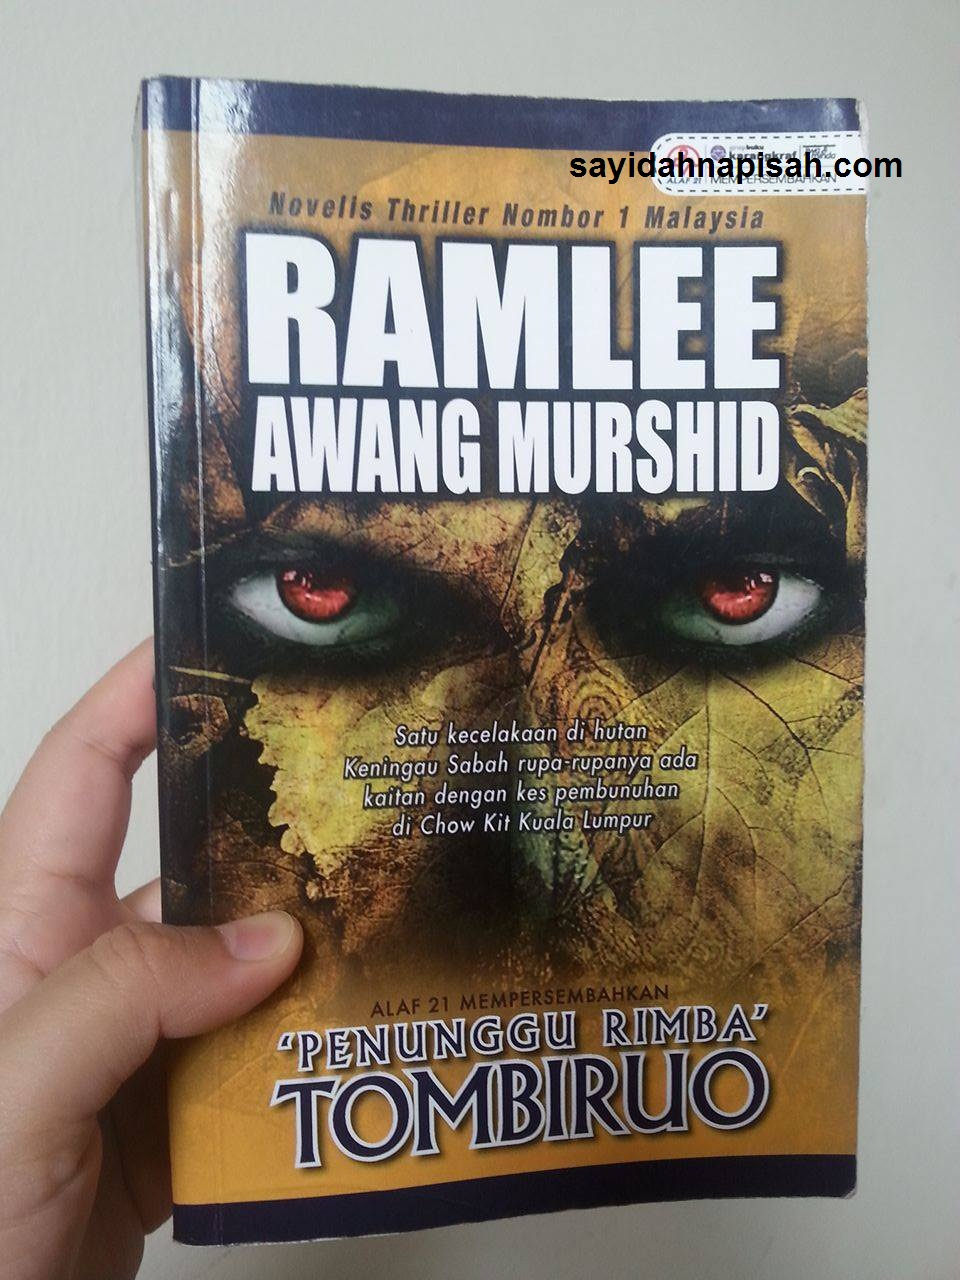 Novel 'Penunggu Rimba' TOMBIRUO - Ramlee Awang Murshid